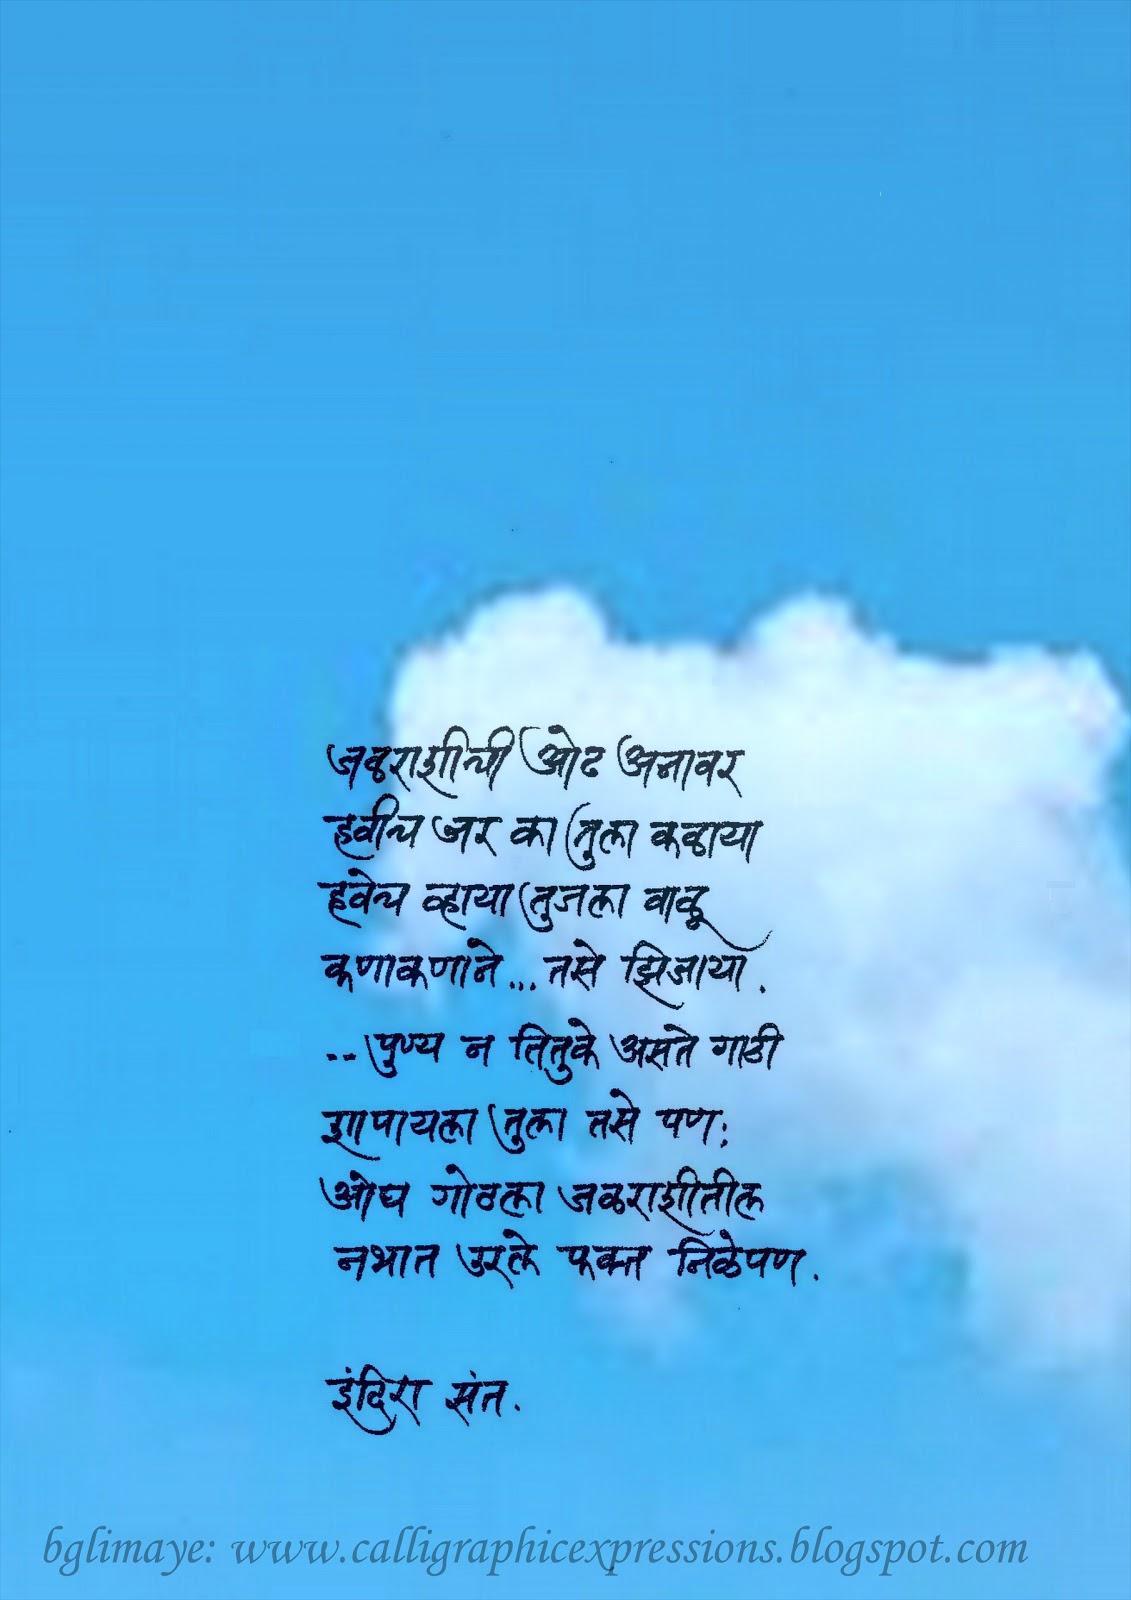 Marathi bal kavita lyrics